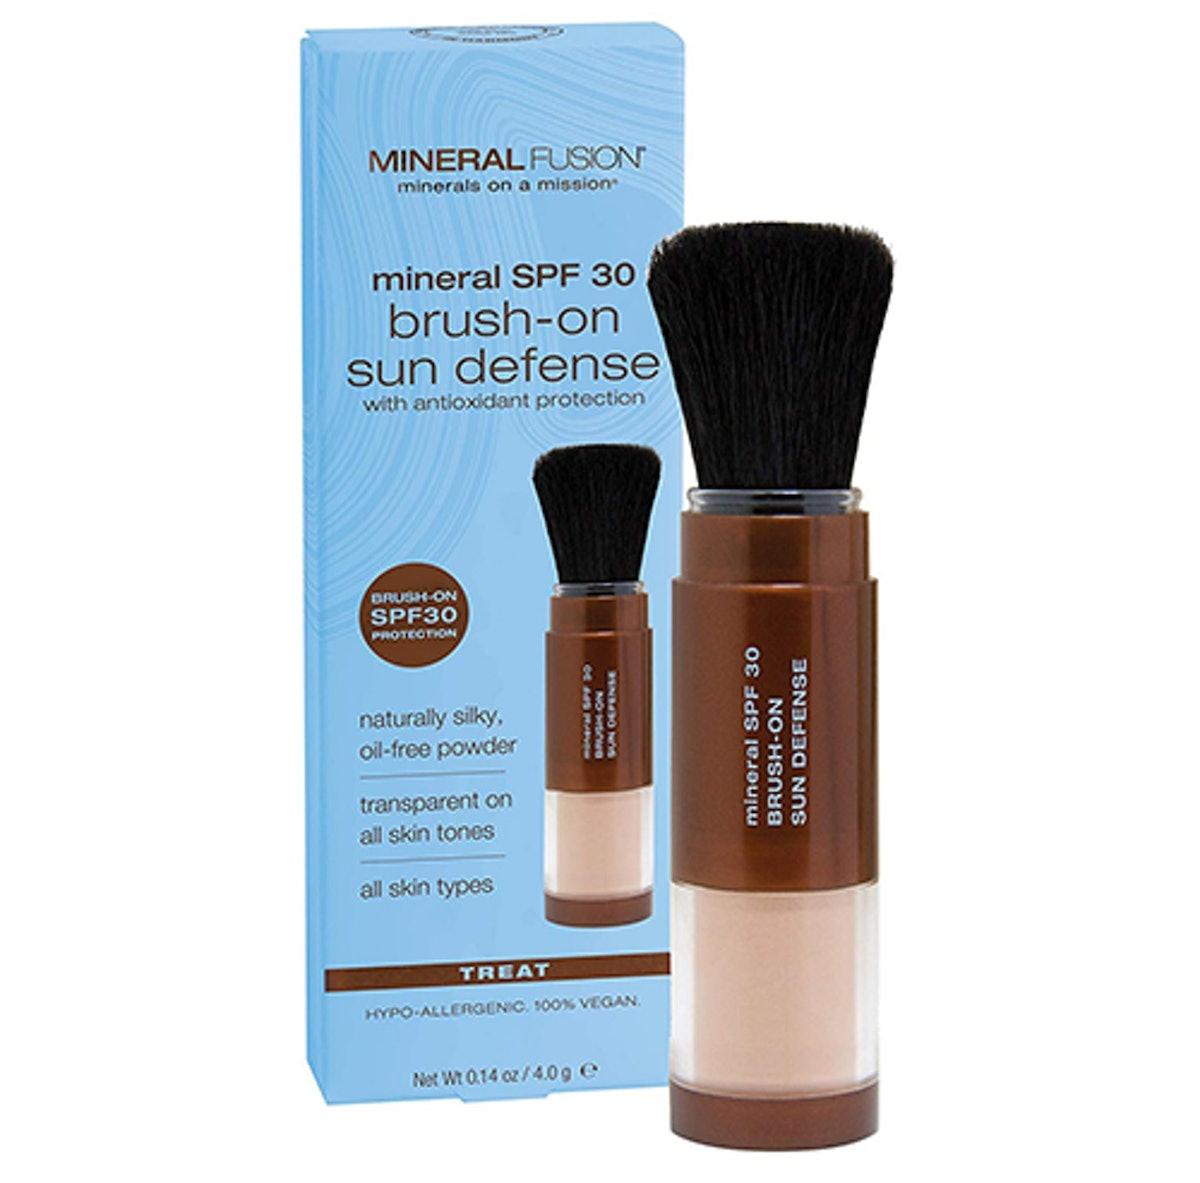 Mineral Fusion Brush-On Sun Defense